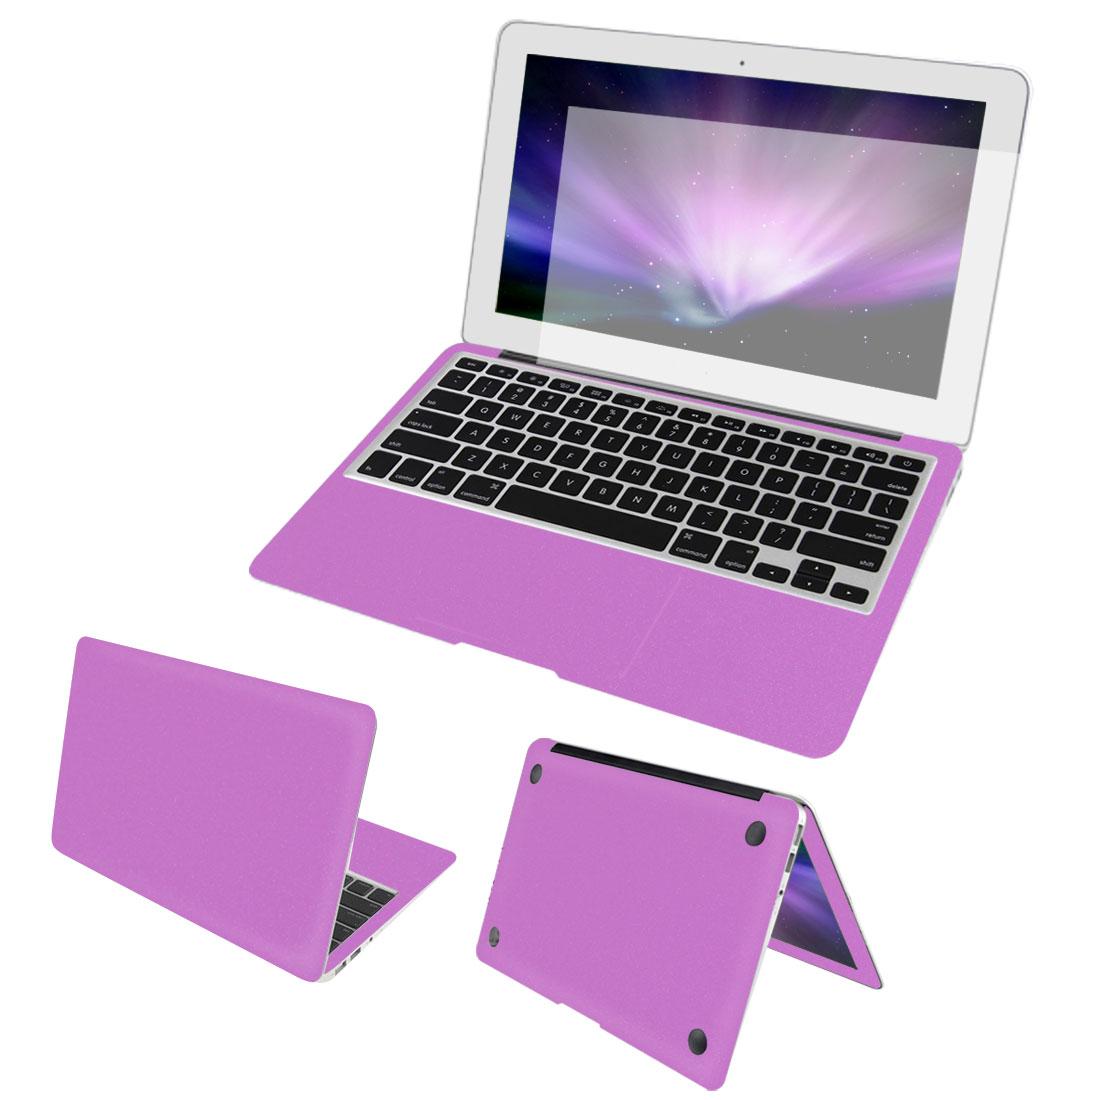 "Pink Full Body Wrap Protector Decal Skin Screen Guard for Macbook Air 13"""